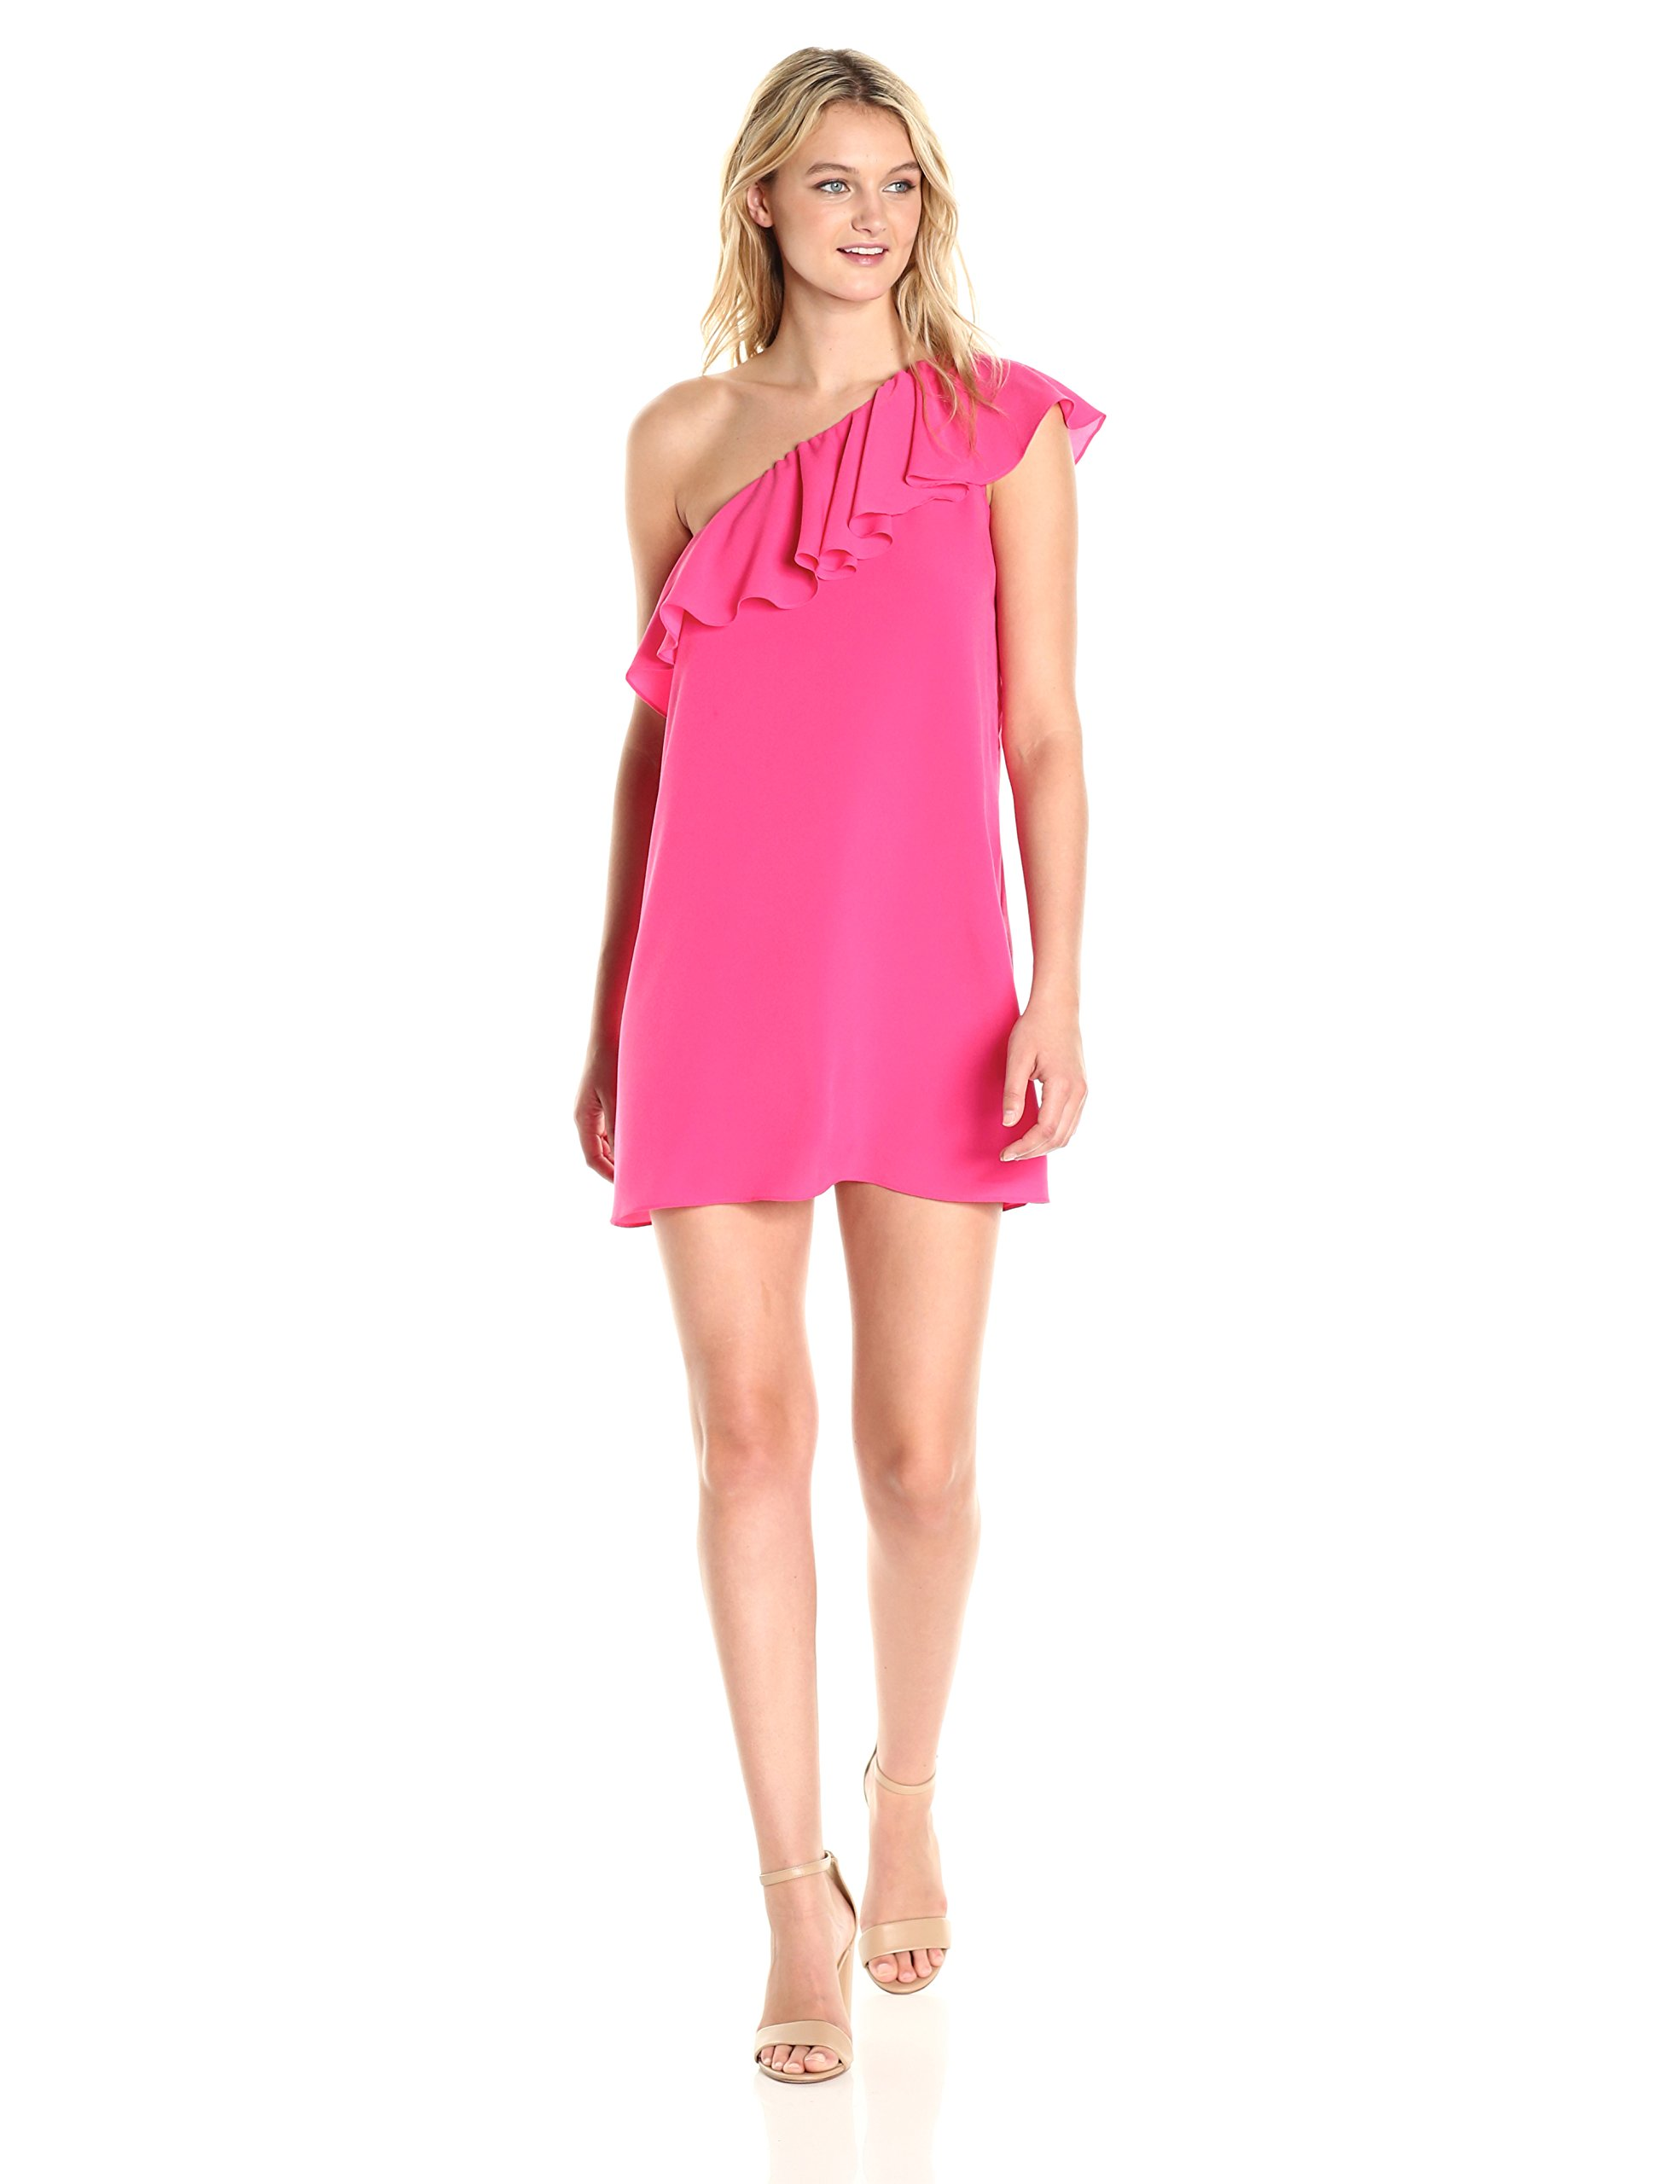 French Connection Women's Summer Crepe Light One Shoulder Dress, Hot Primrose, XS